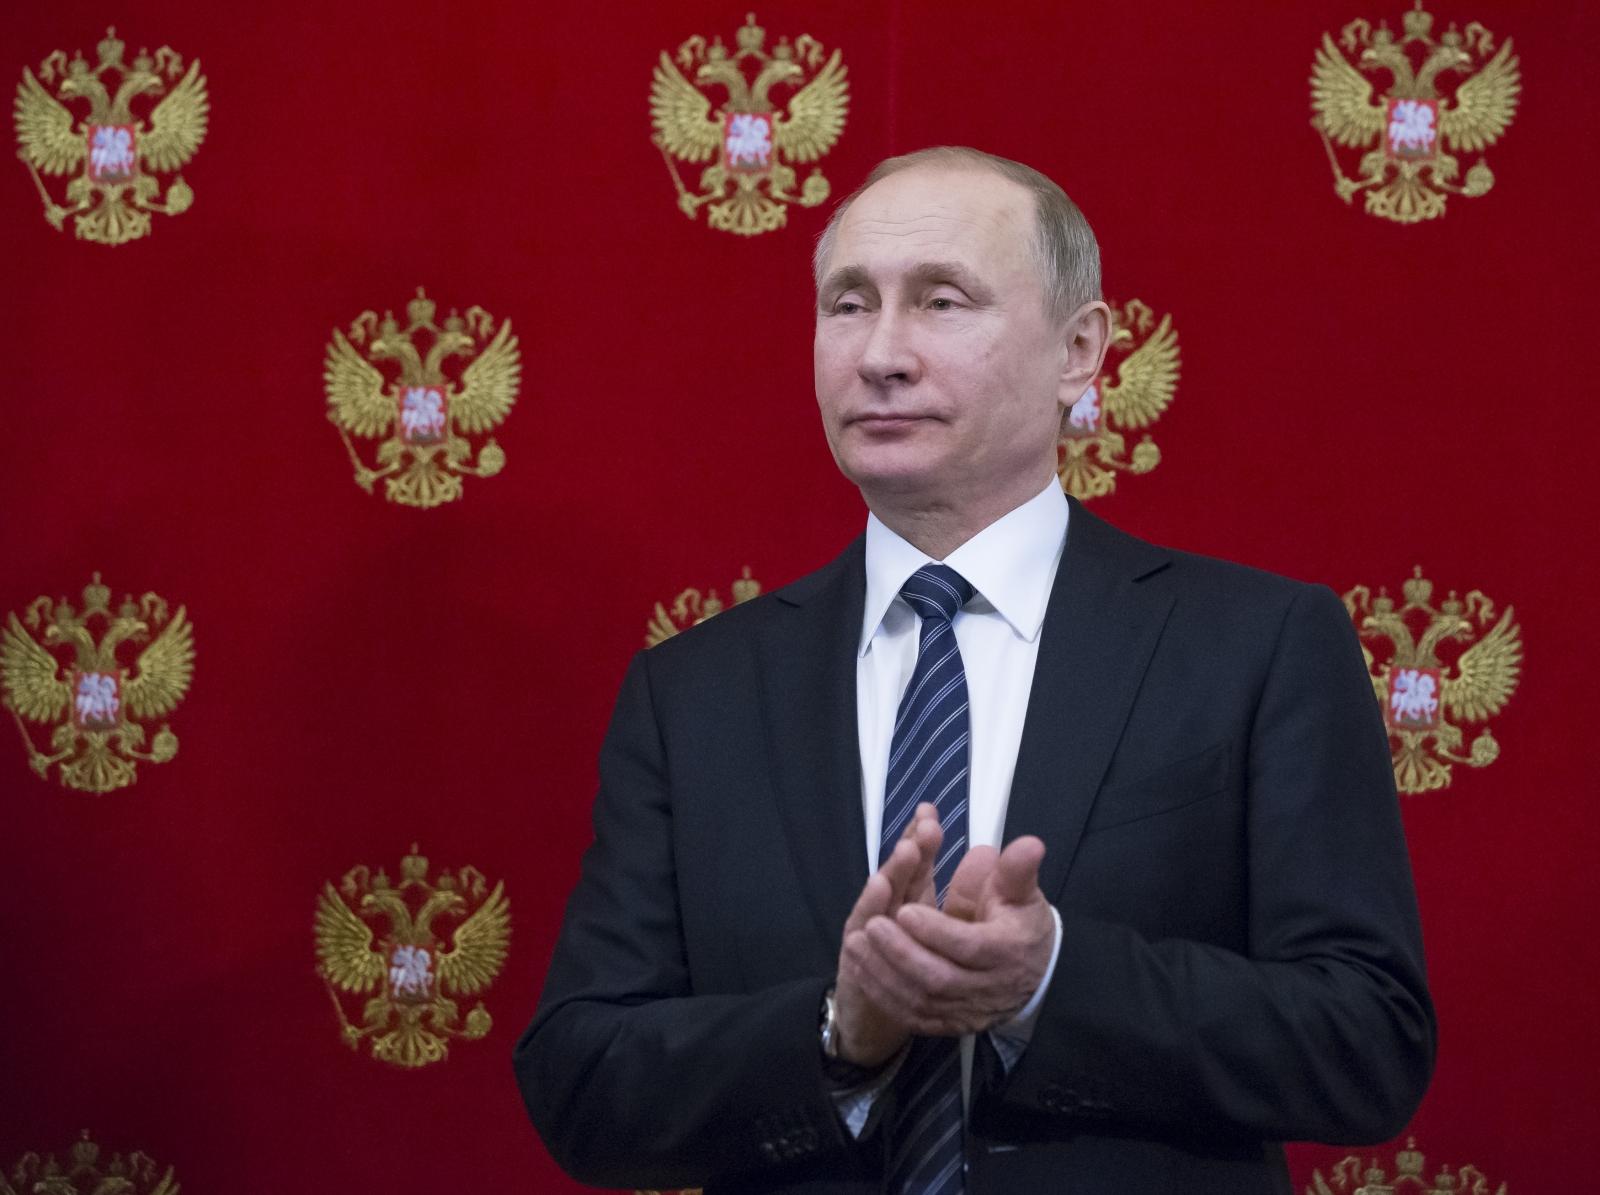 Ukraine crisis Russia veto power